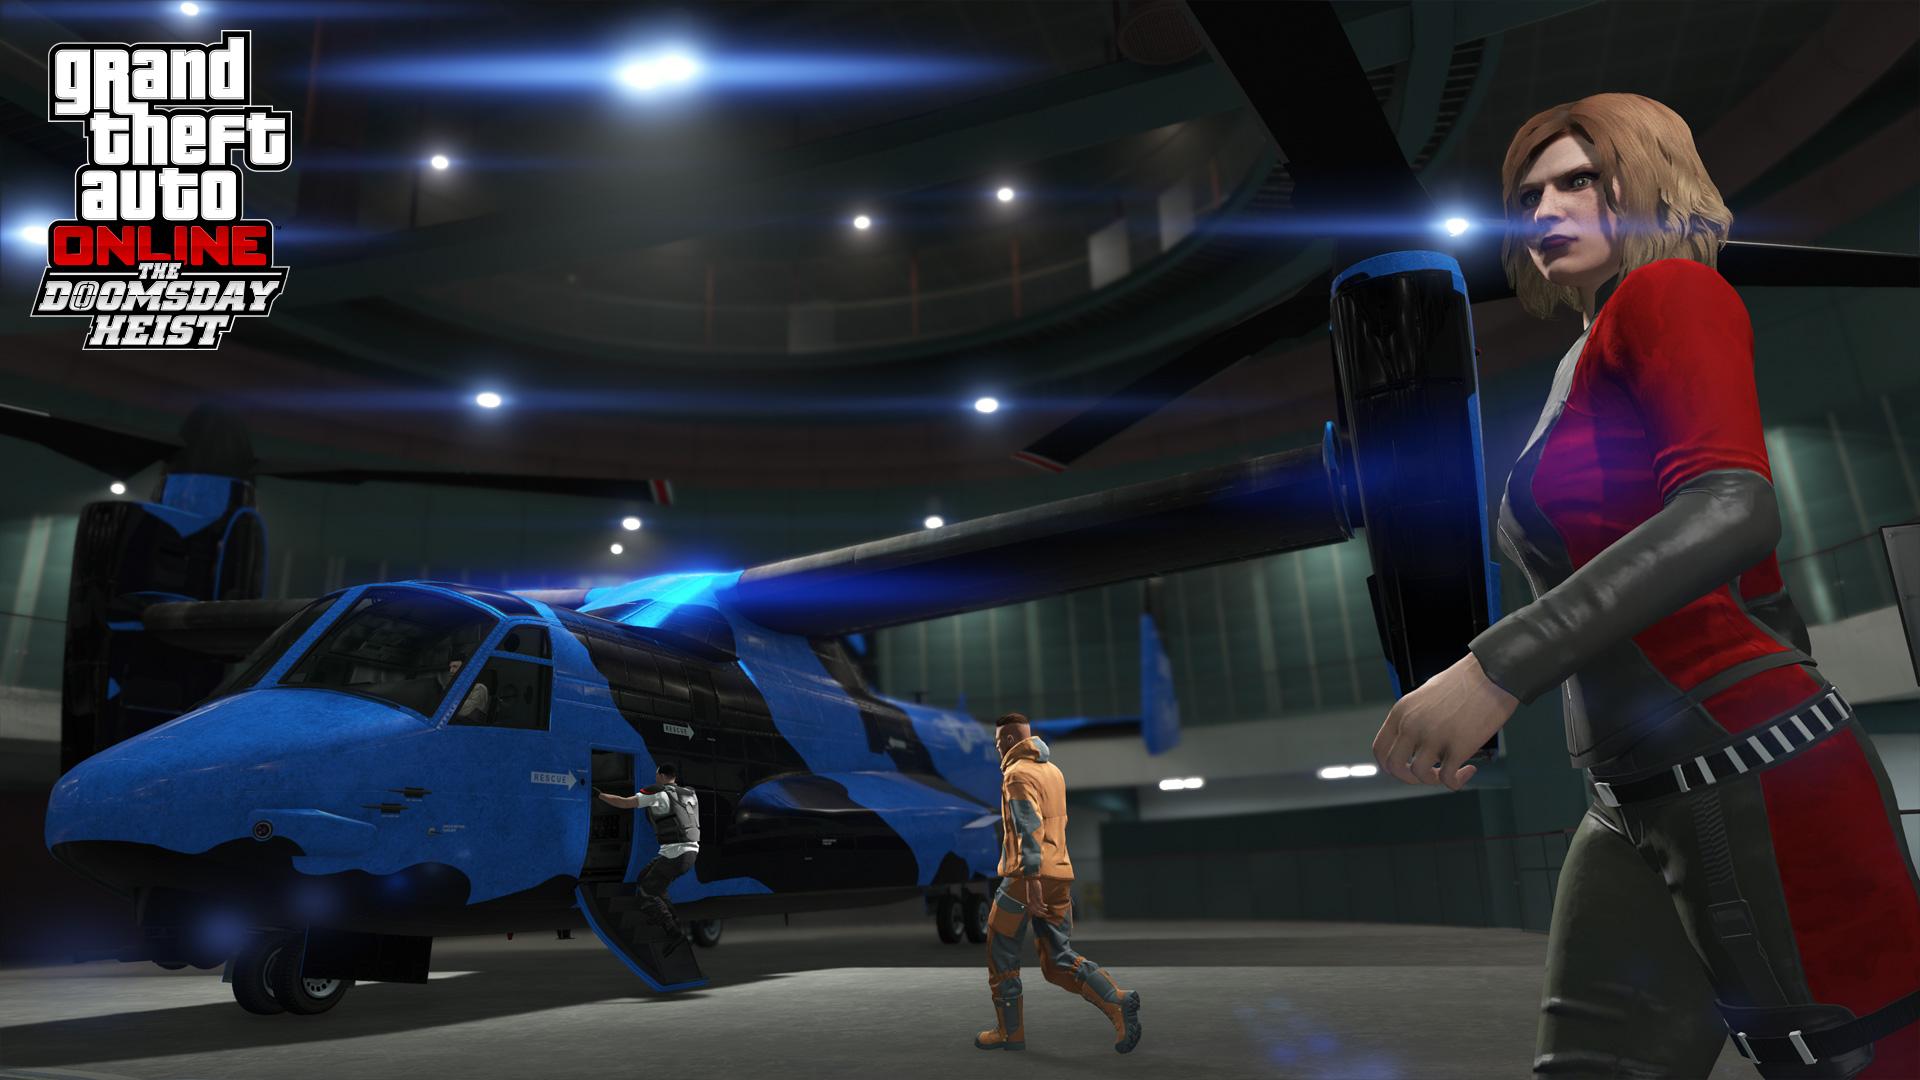 GTA5 Grand Theft Auto V